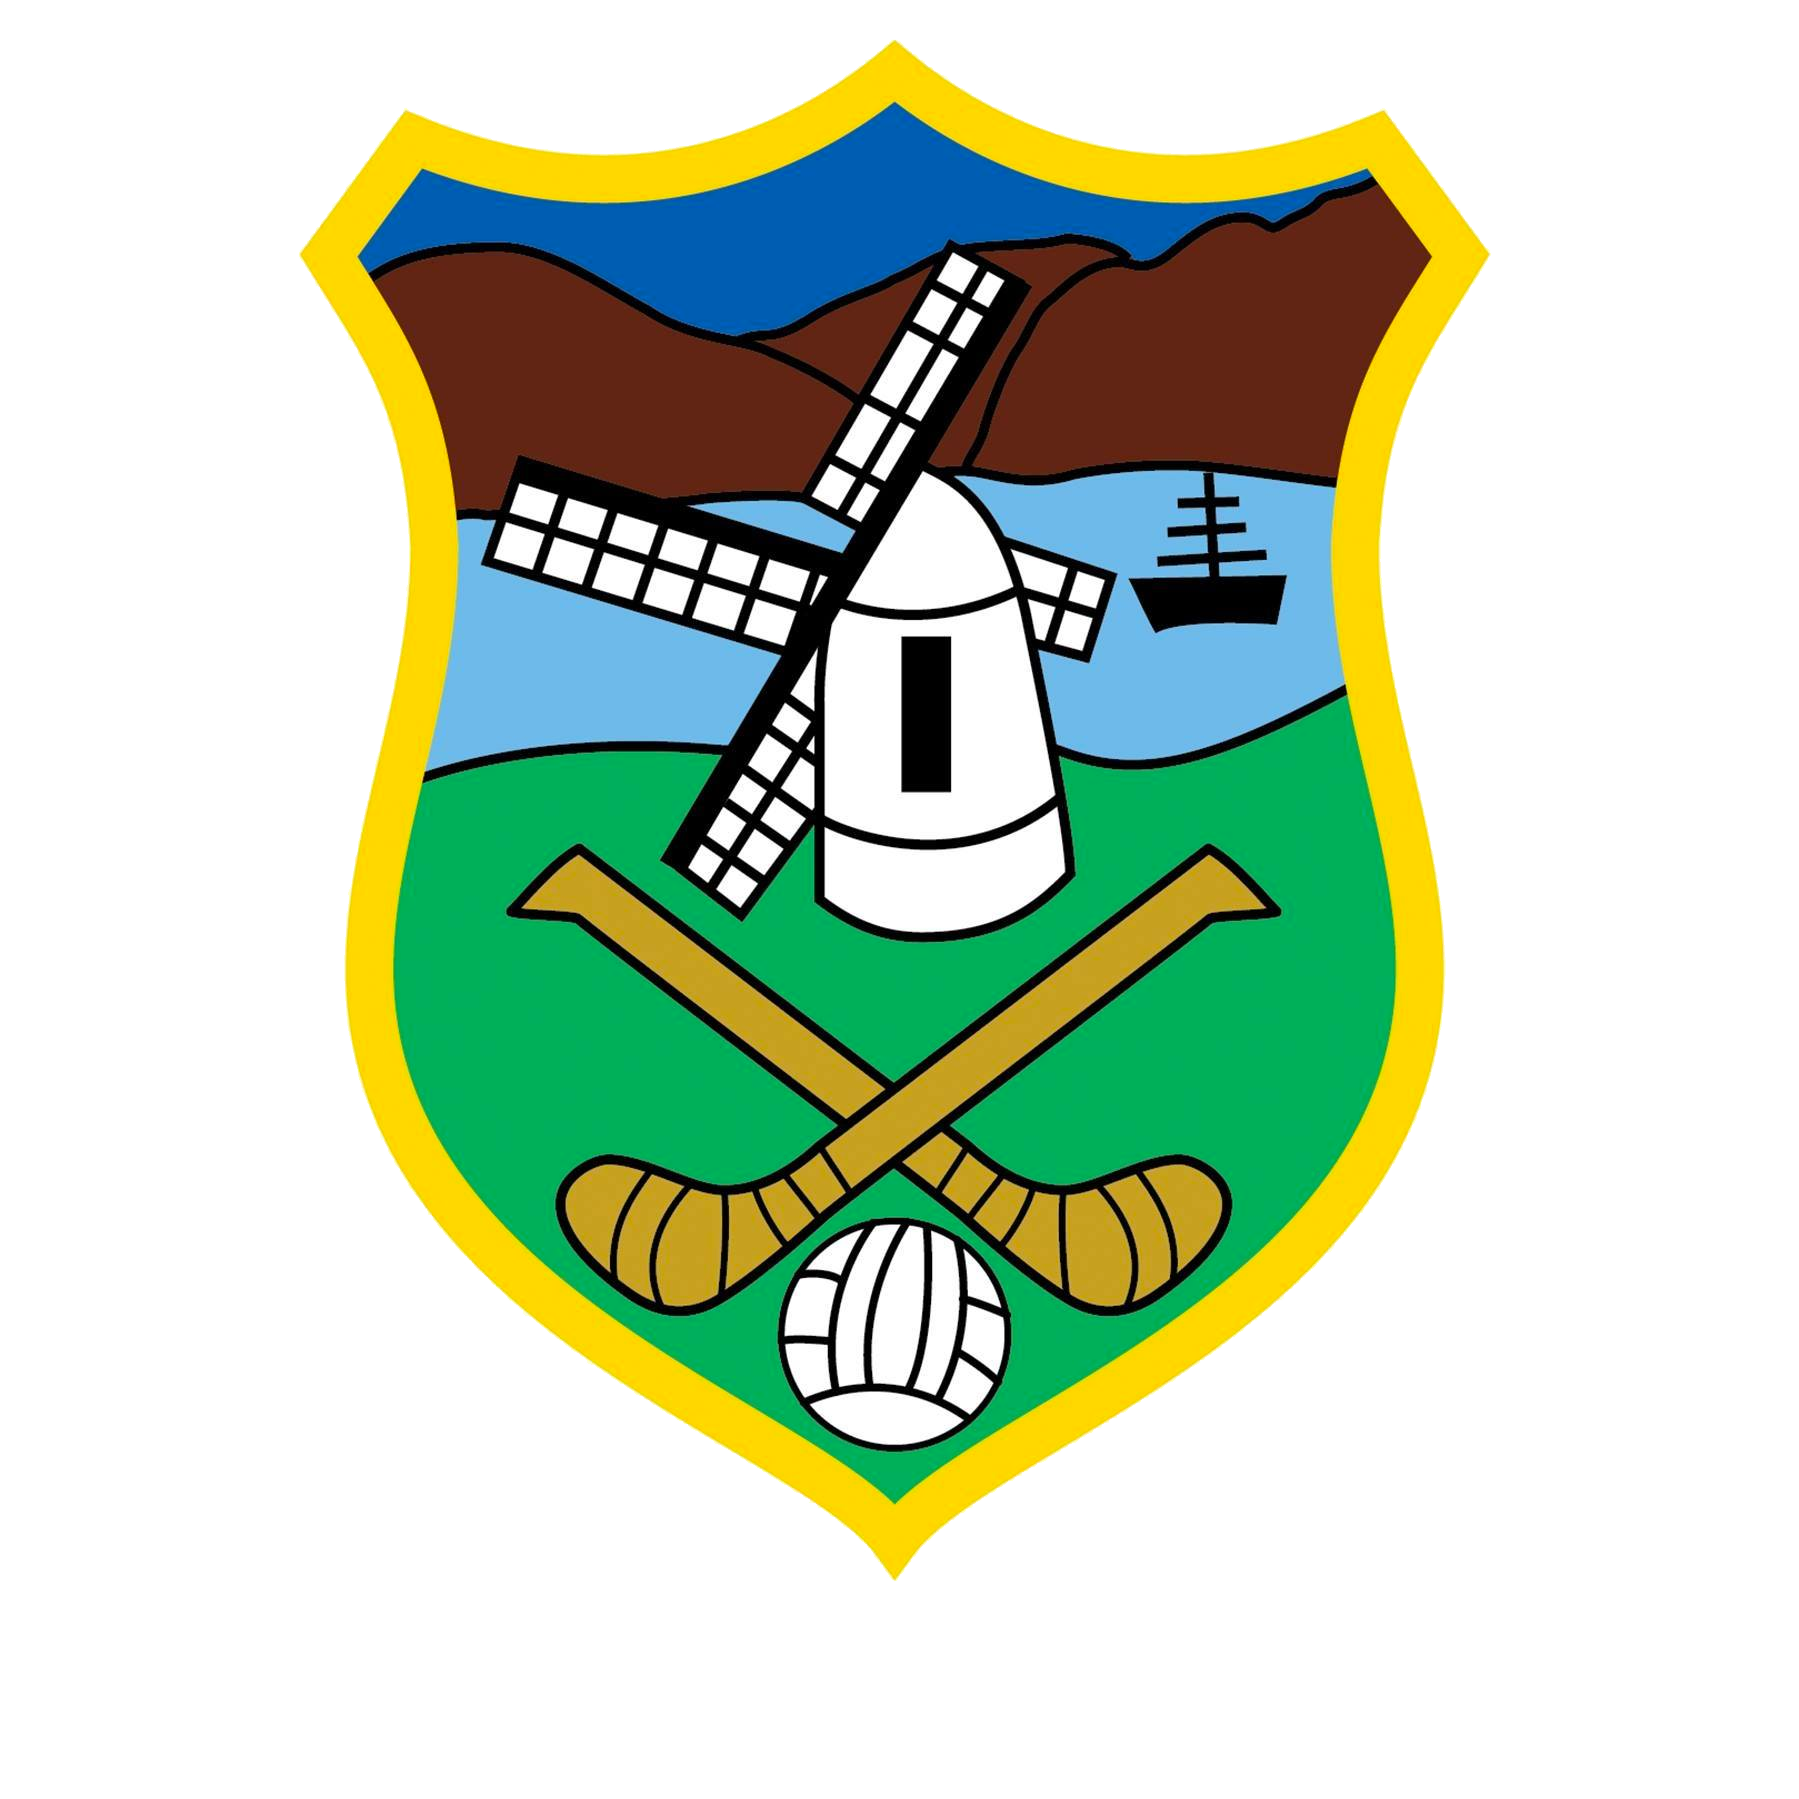 St. Peter's GAA Club Warrenpoint